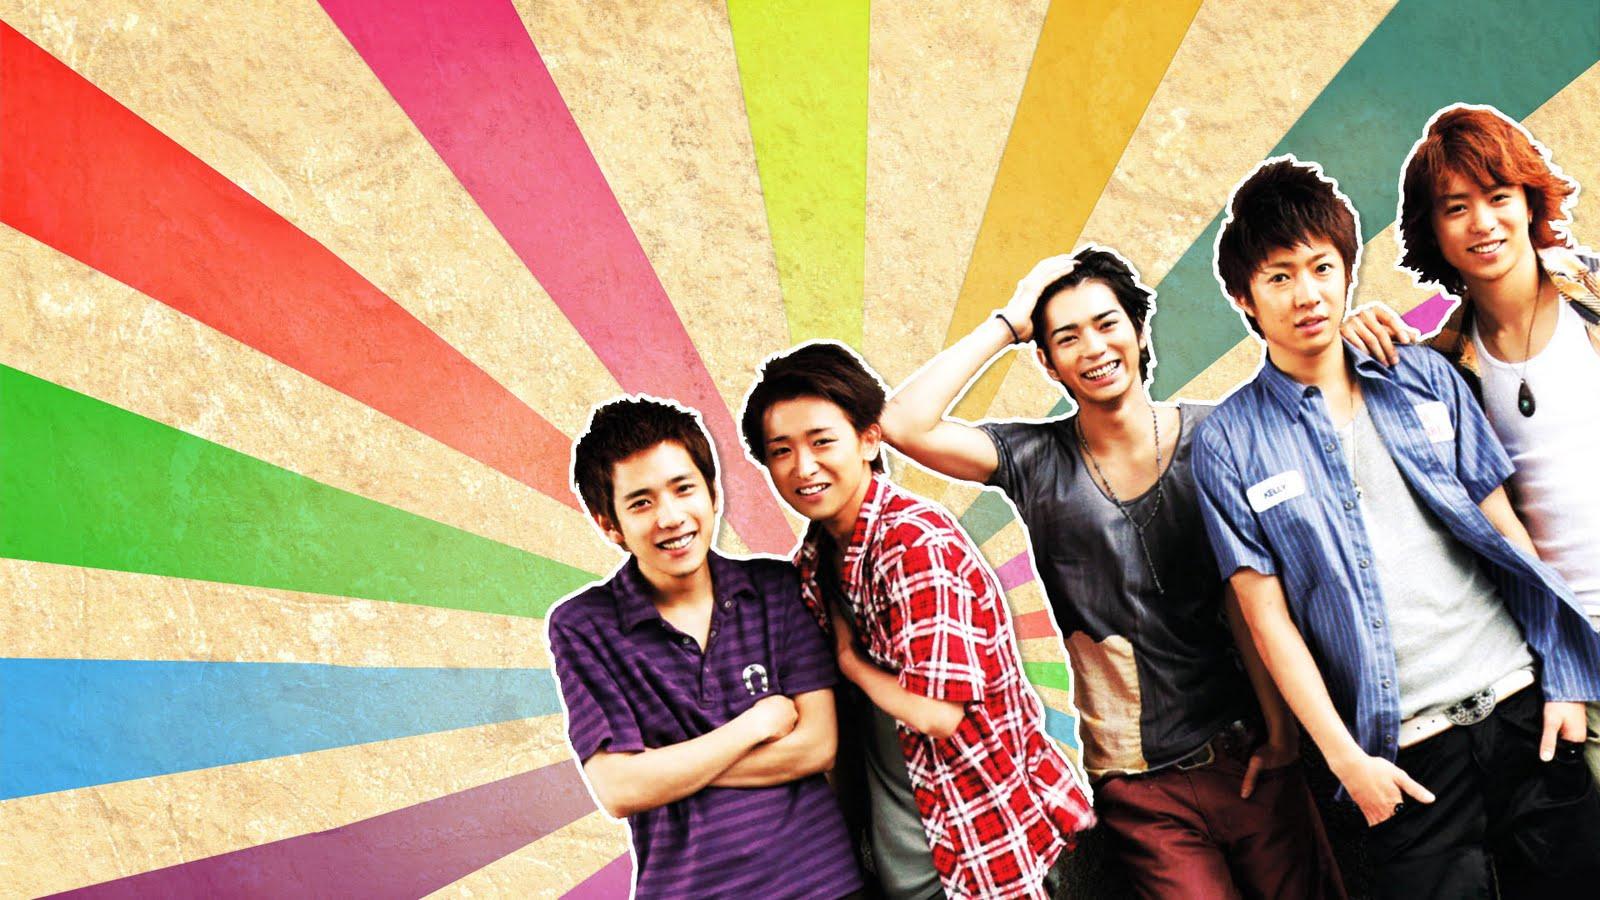 http://2.bp.blogspot.com/-o65sgxVUF6w/TgCL8GM2pRI/AAAAAAAAAAQ/Tteit1bFVOo/s1600/wallpaper-arashi_rainbowfivesome-1920x1080-by-tashiichaan.jpg